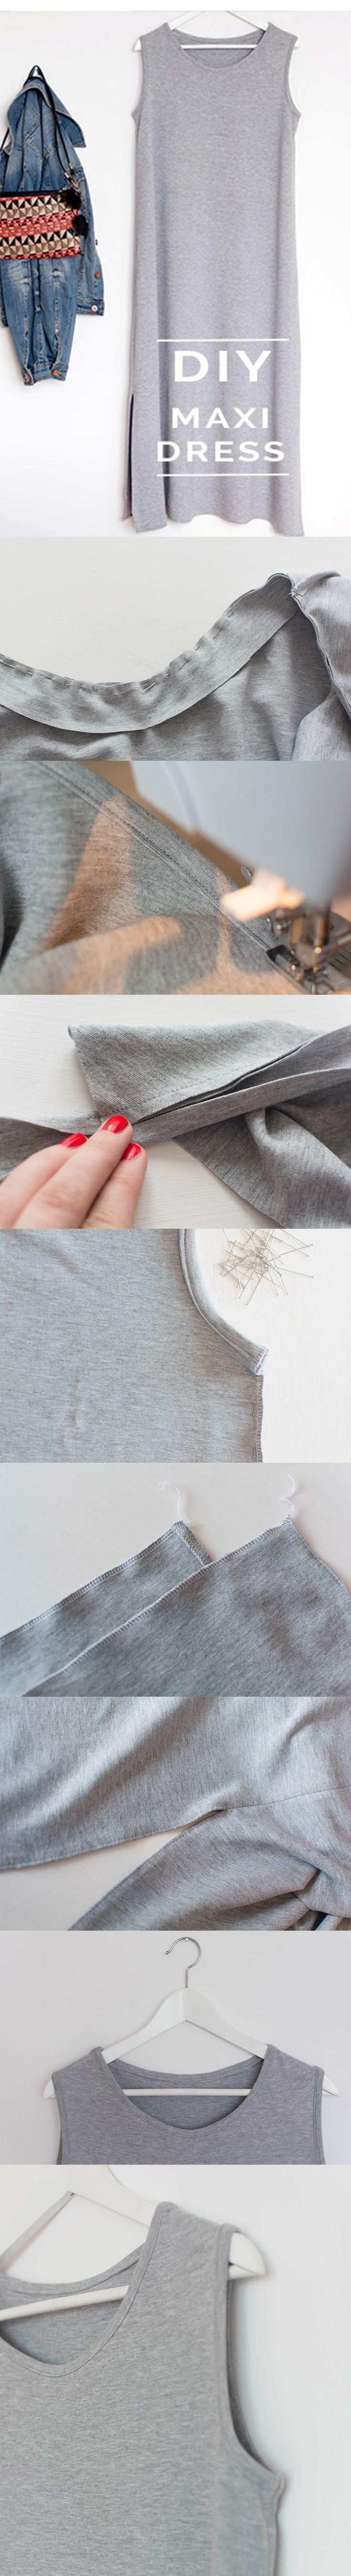 maxidress ^ DIY ^ howto ^ tutorial ^ grey ^ jerseydress